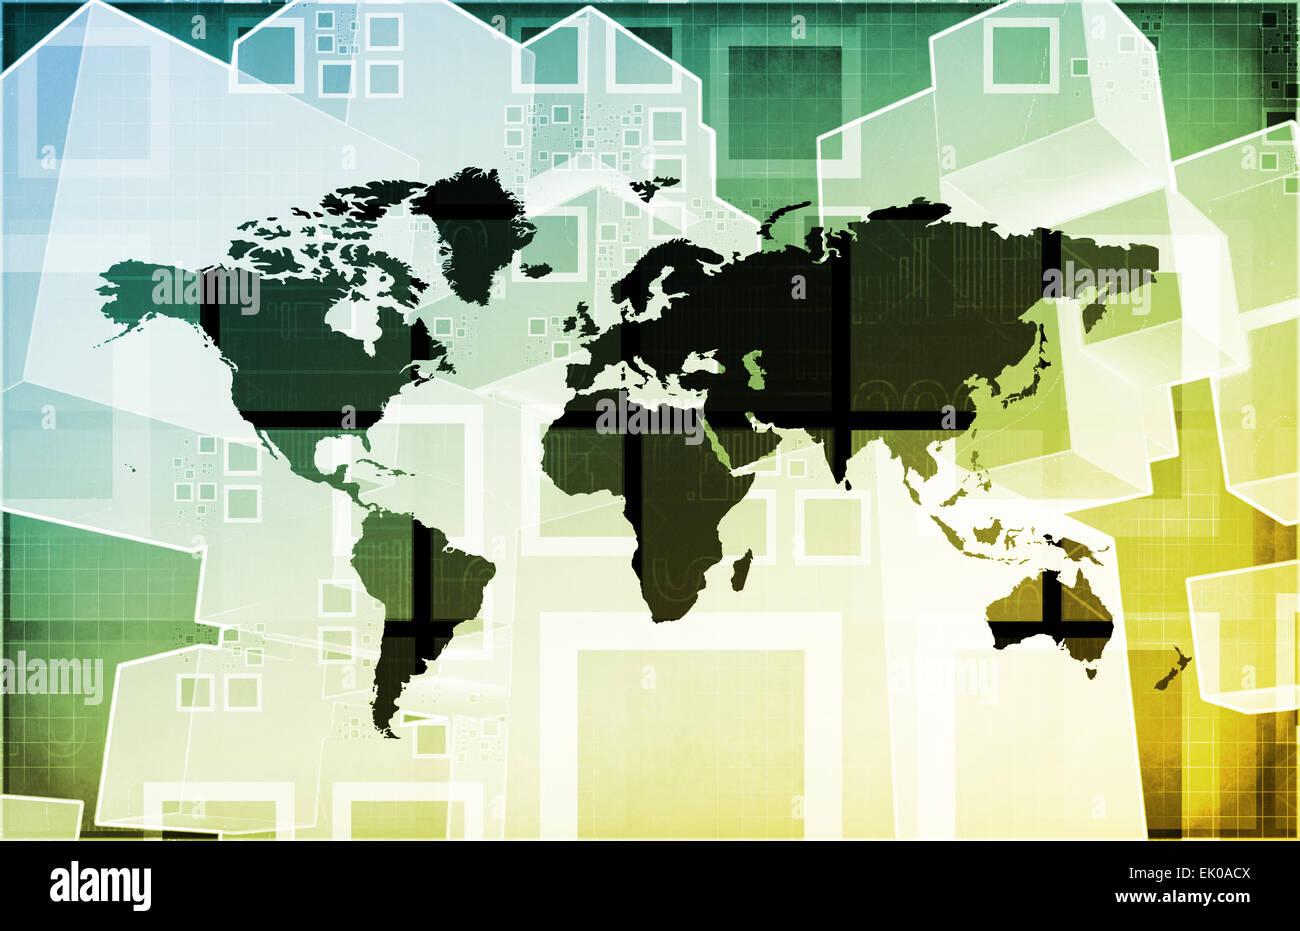 Emerging Market and International Global Businesses Art Stock Photo